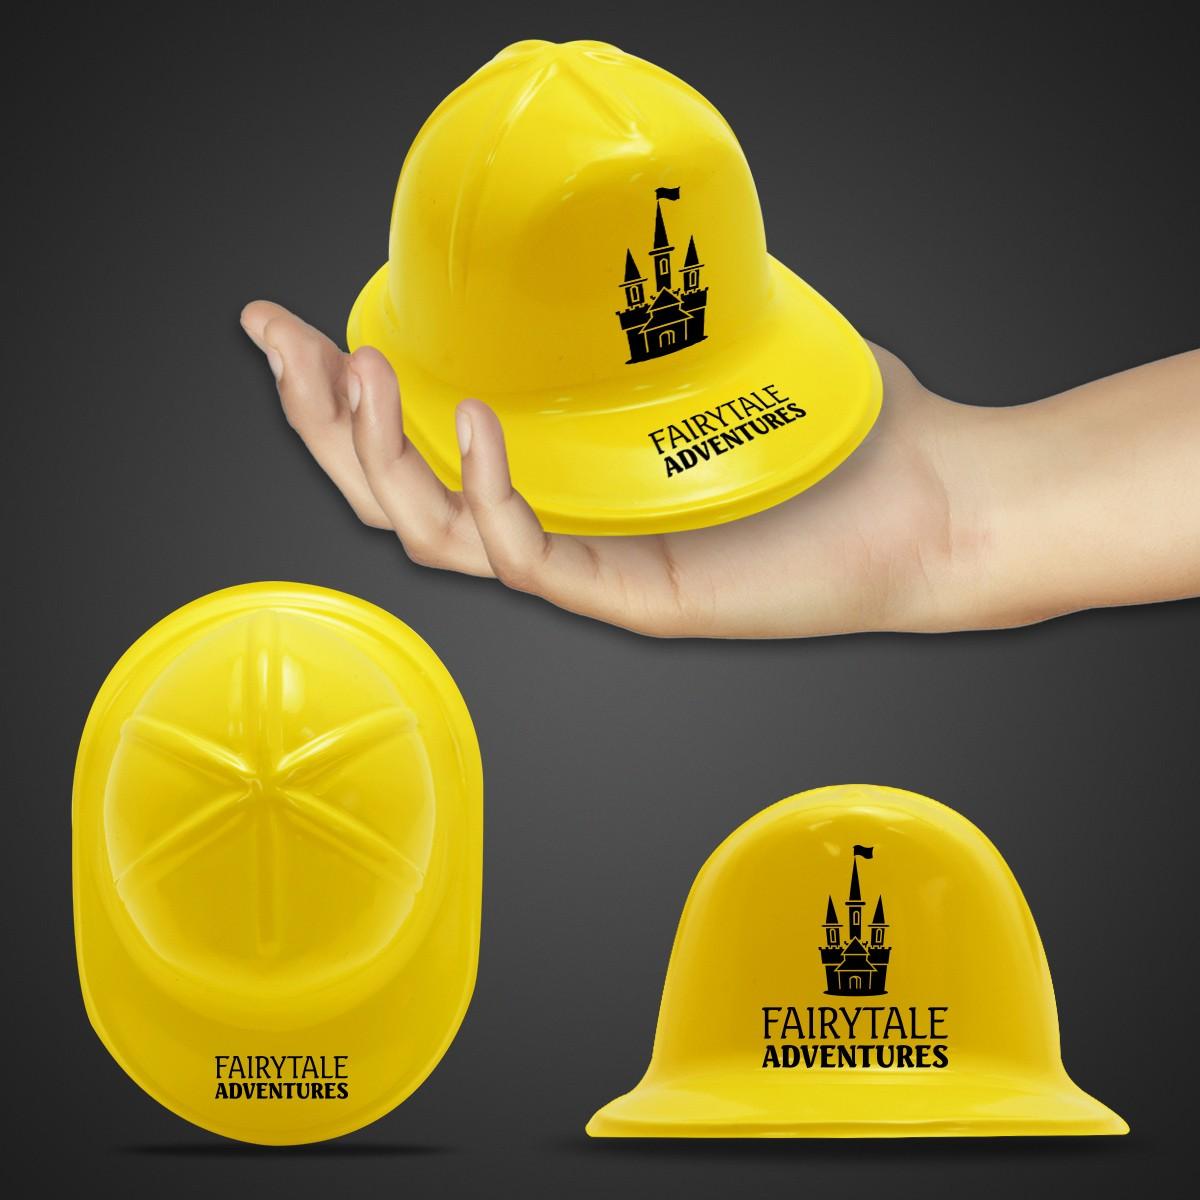 Mini Yellow Plastic Construction Hat